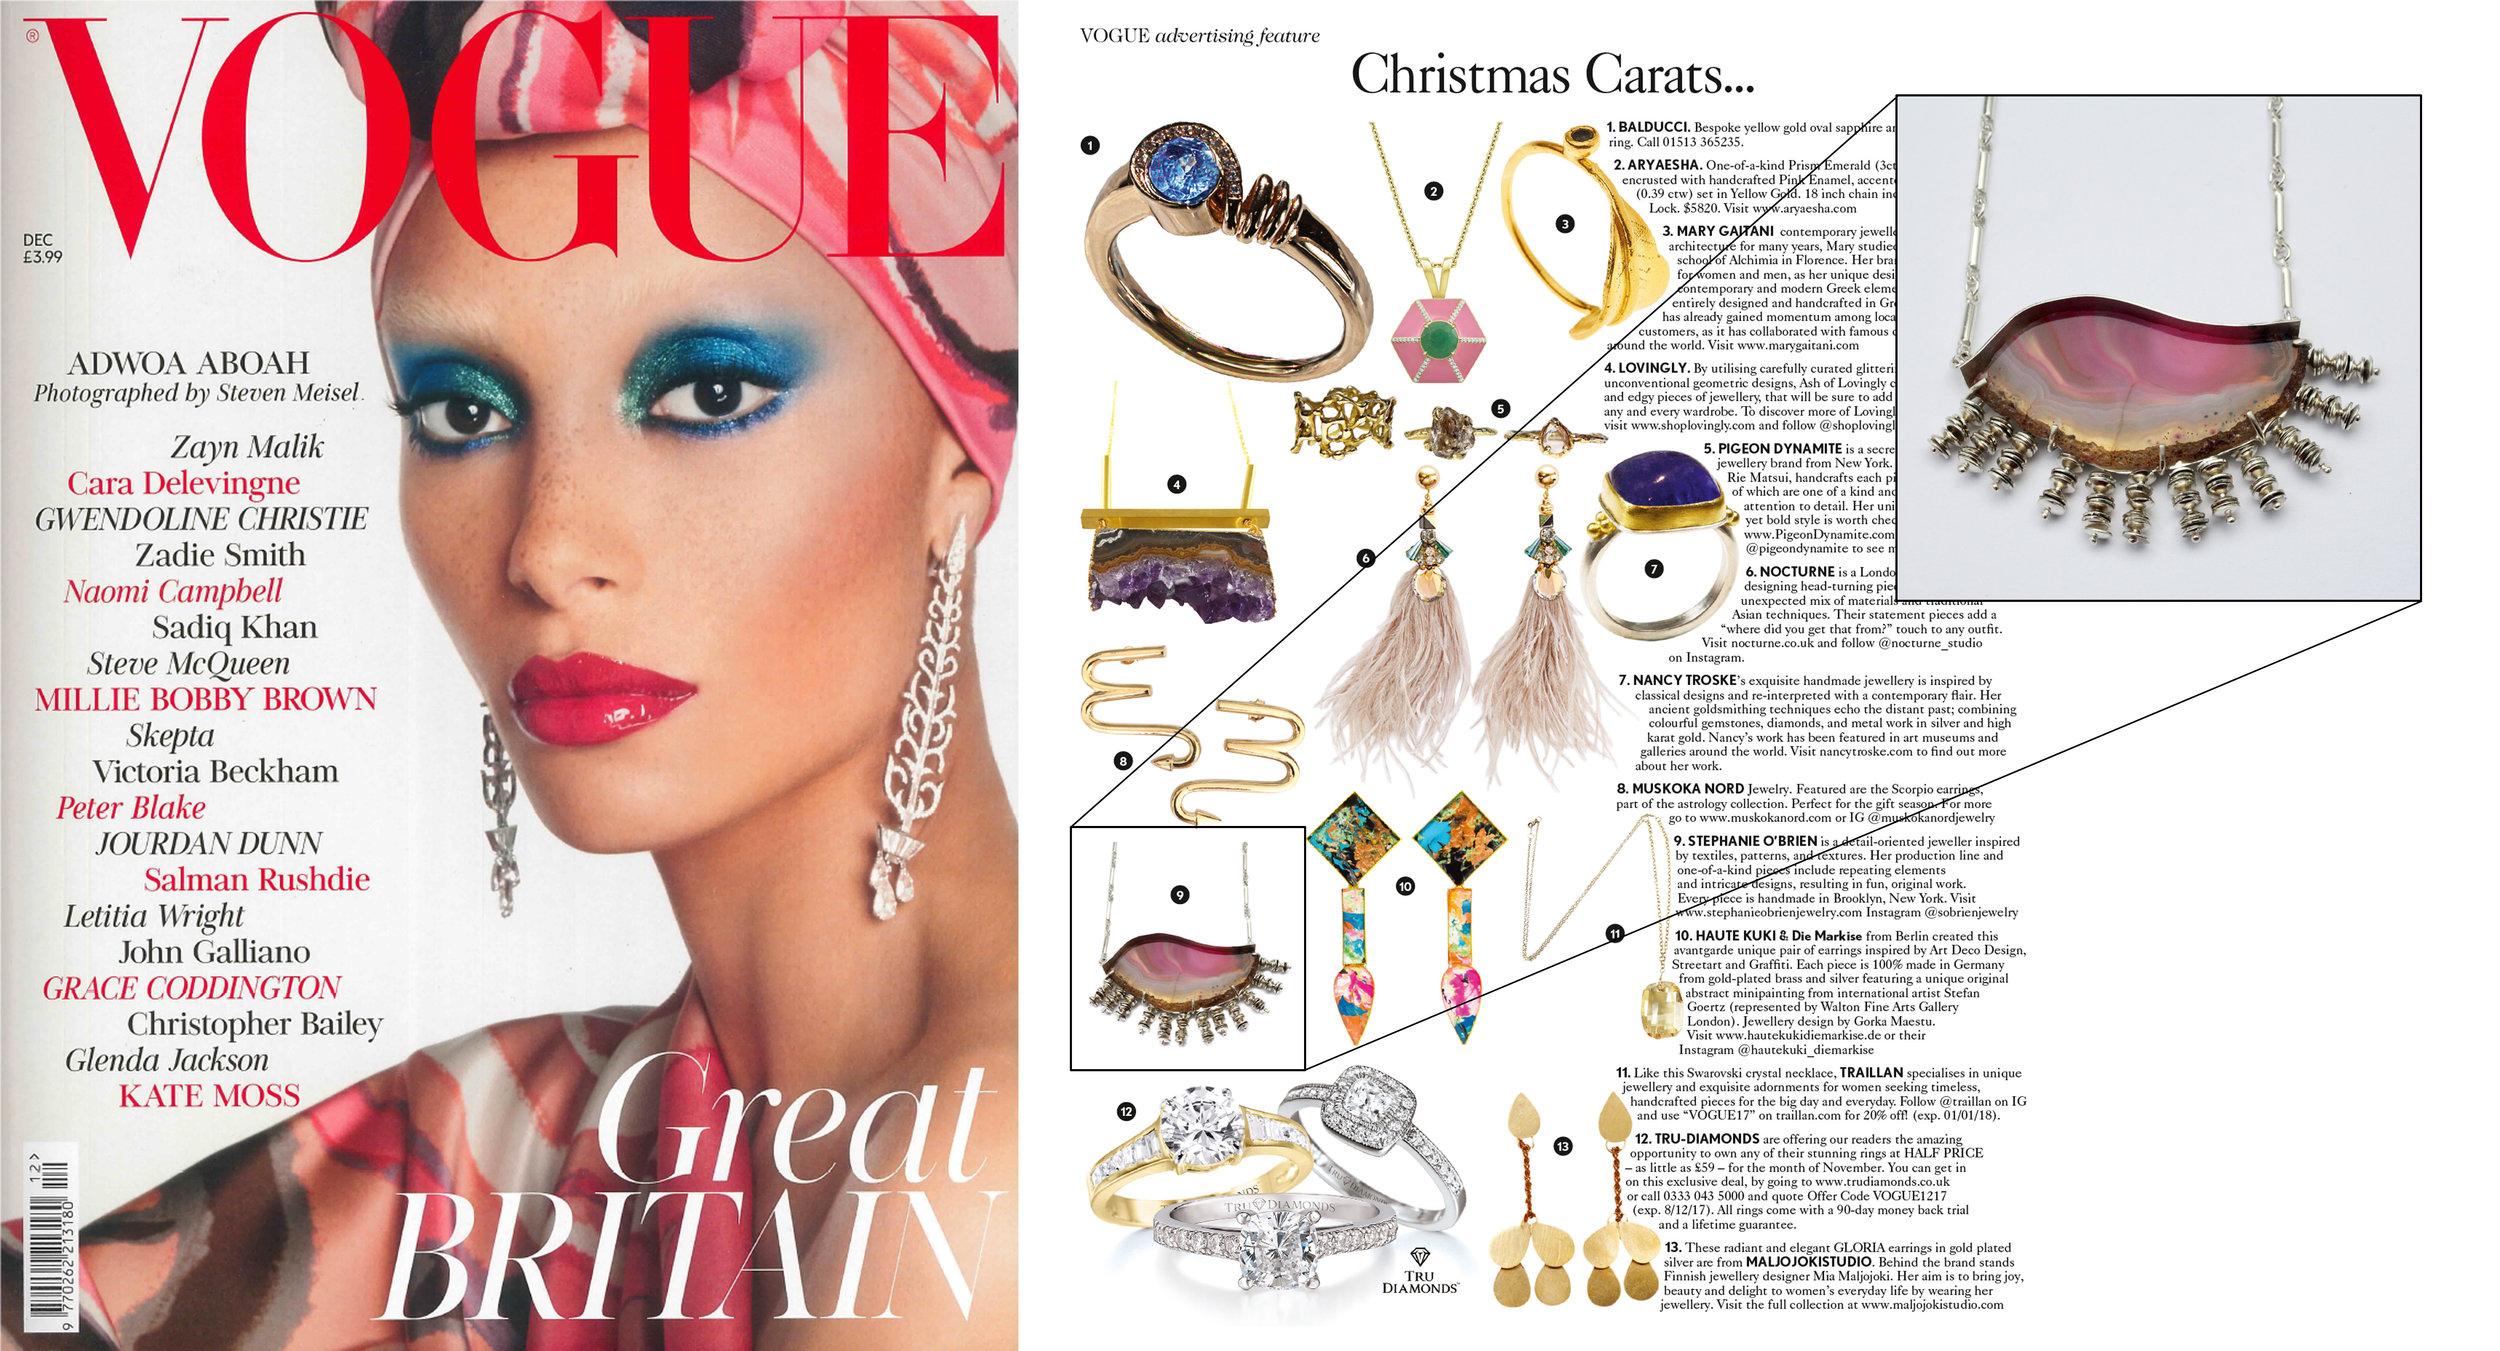 British Vogue Christmas Carats...,December 2017